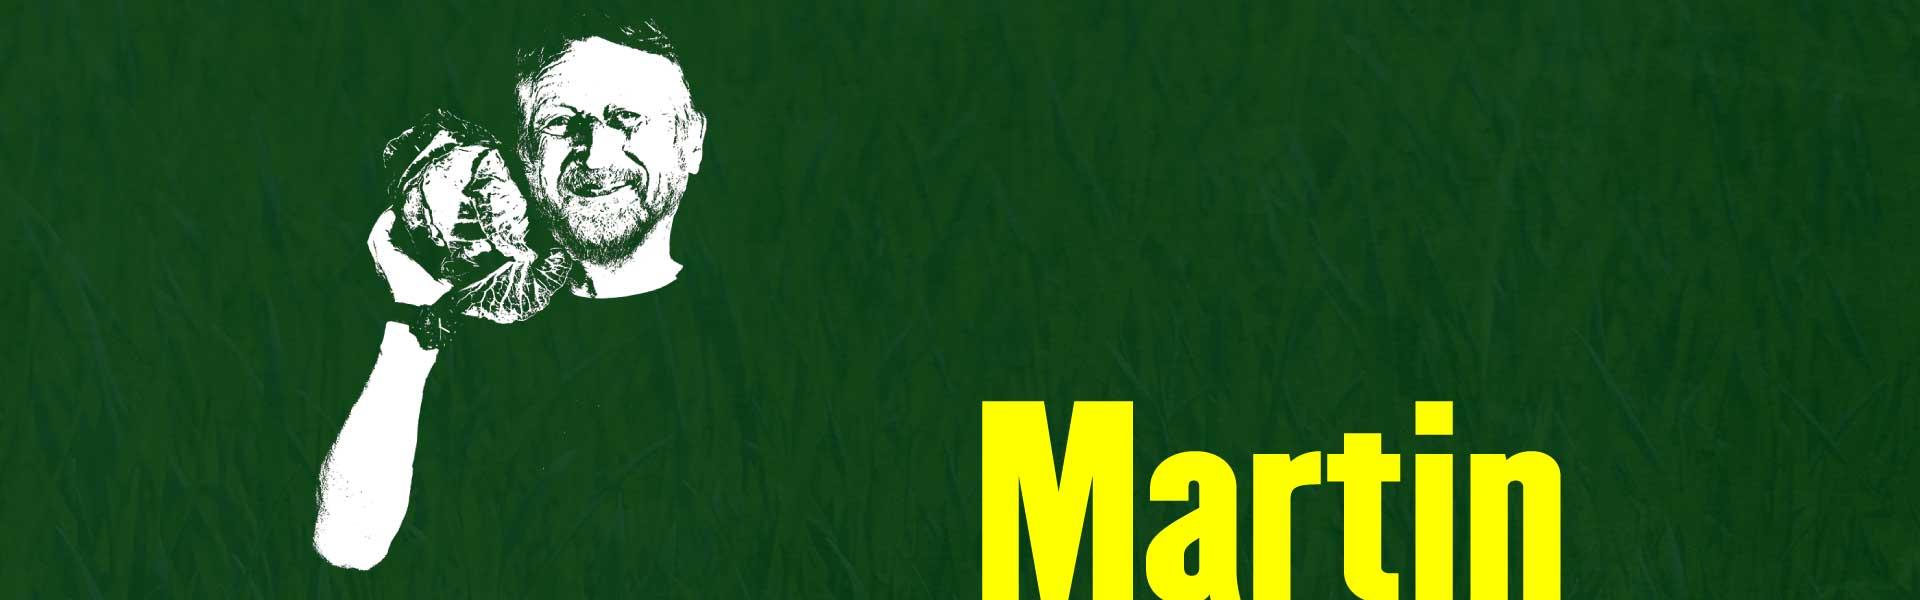 "<a href=""http://hiddenrochdale.co.uk/martin/"">Martin</a><br/><p>"